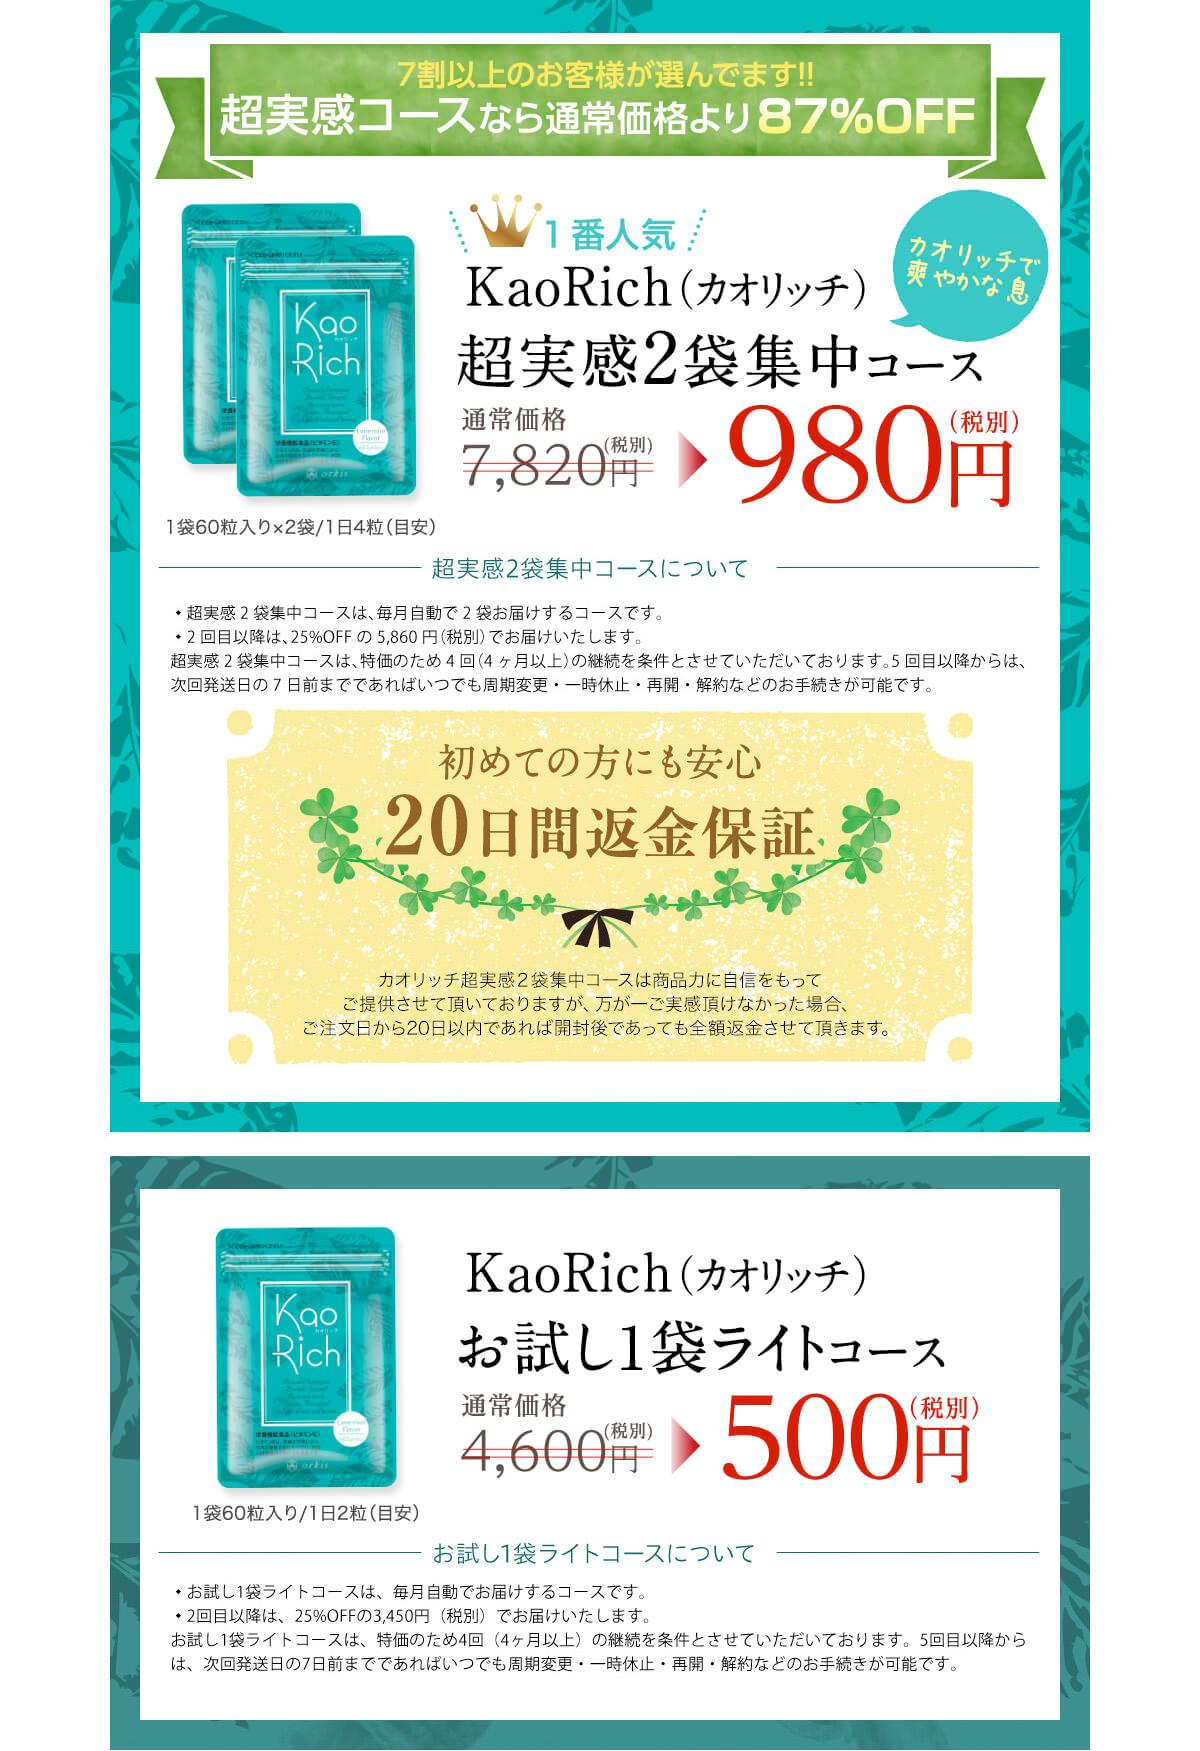 KaoRich(カオリッチ)の定価・定期購入価格